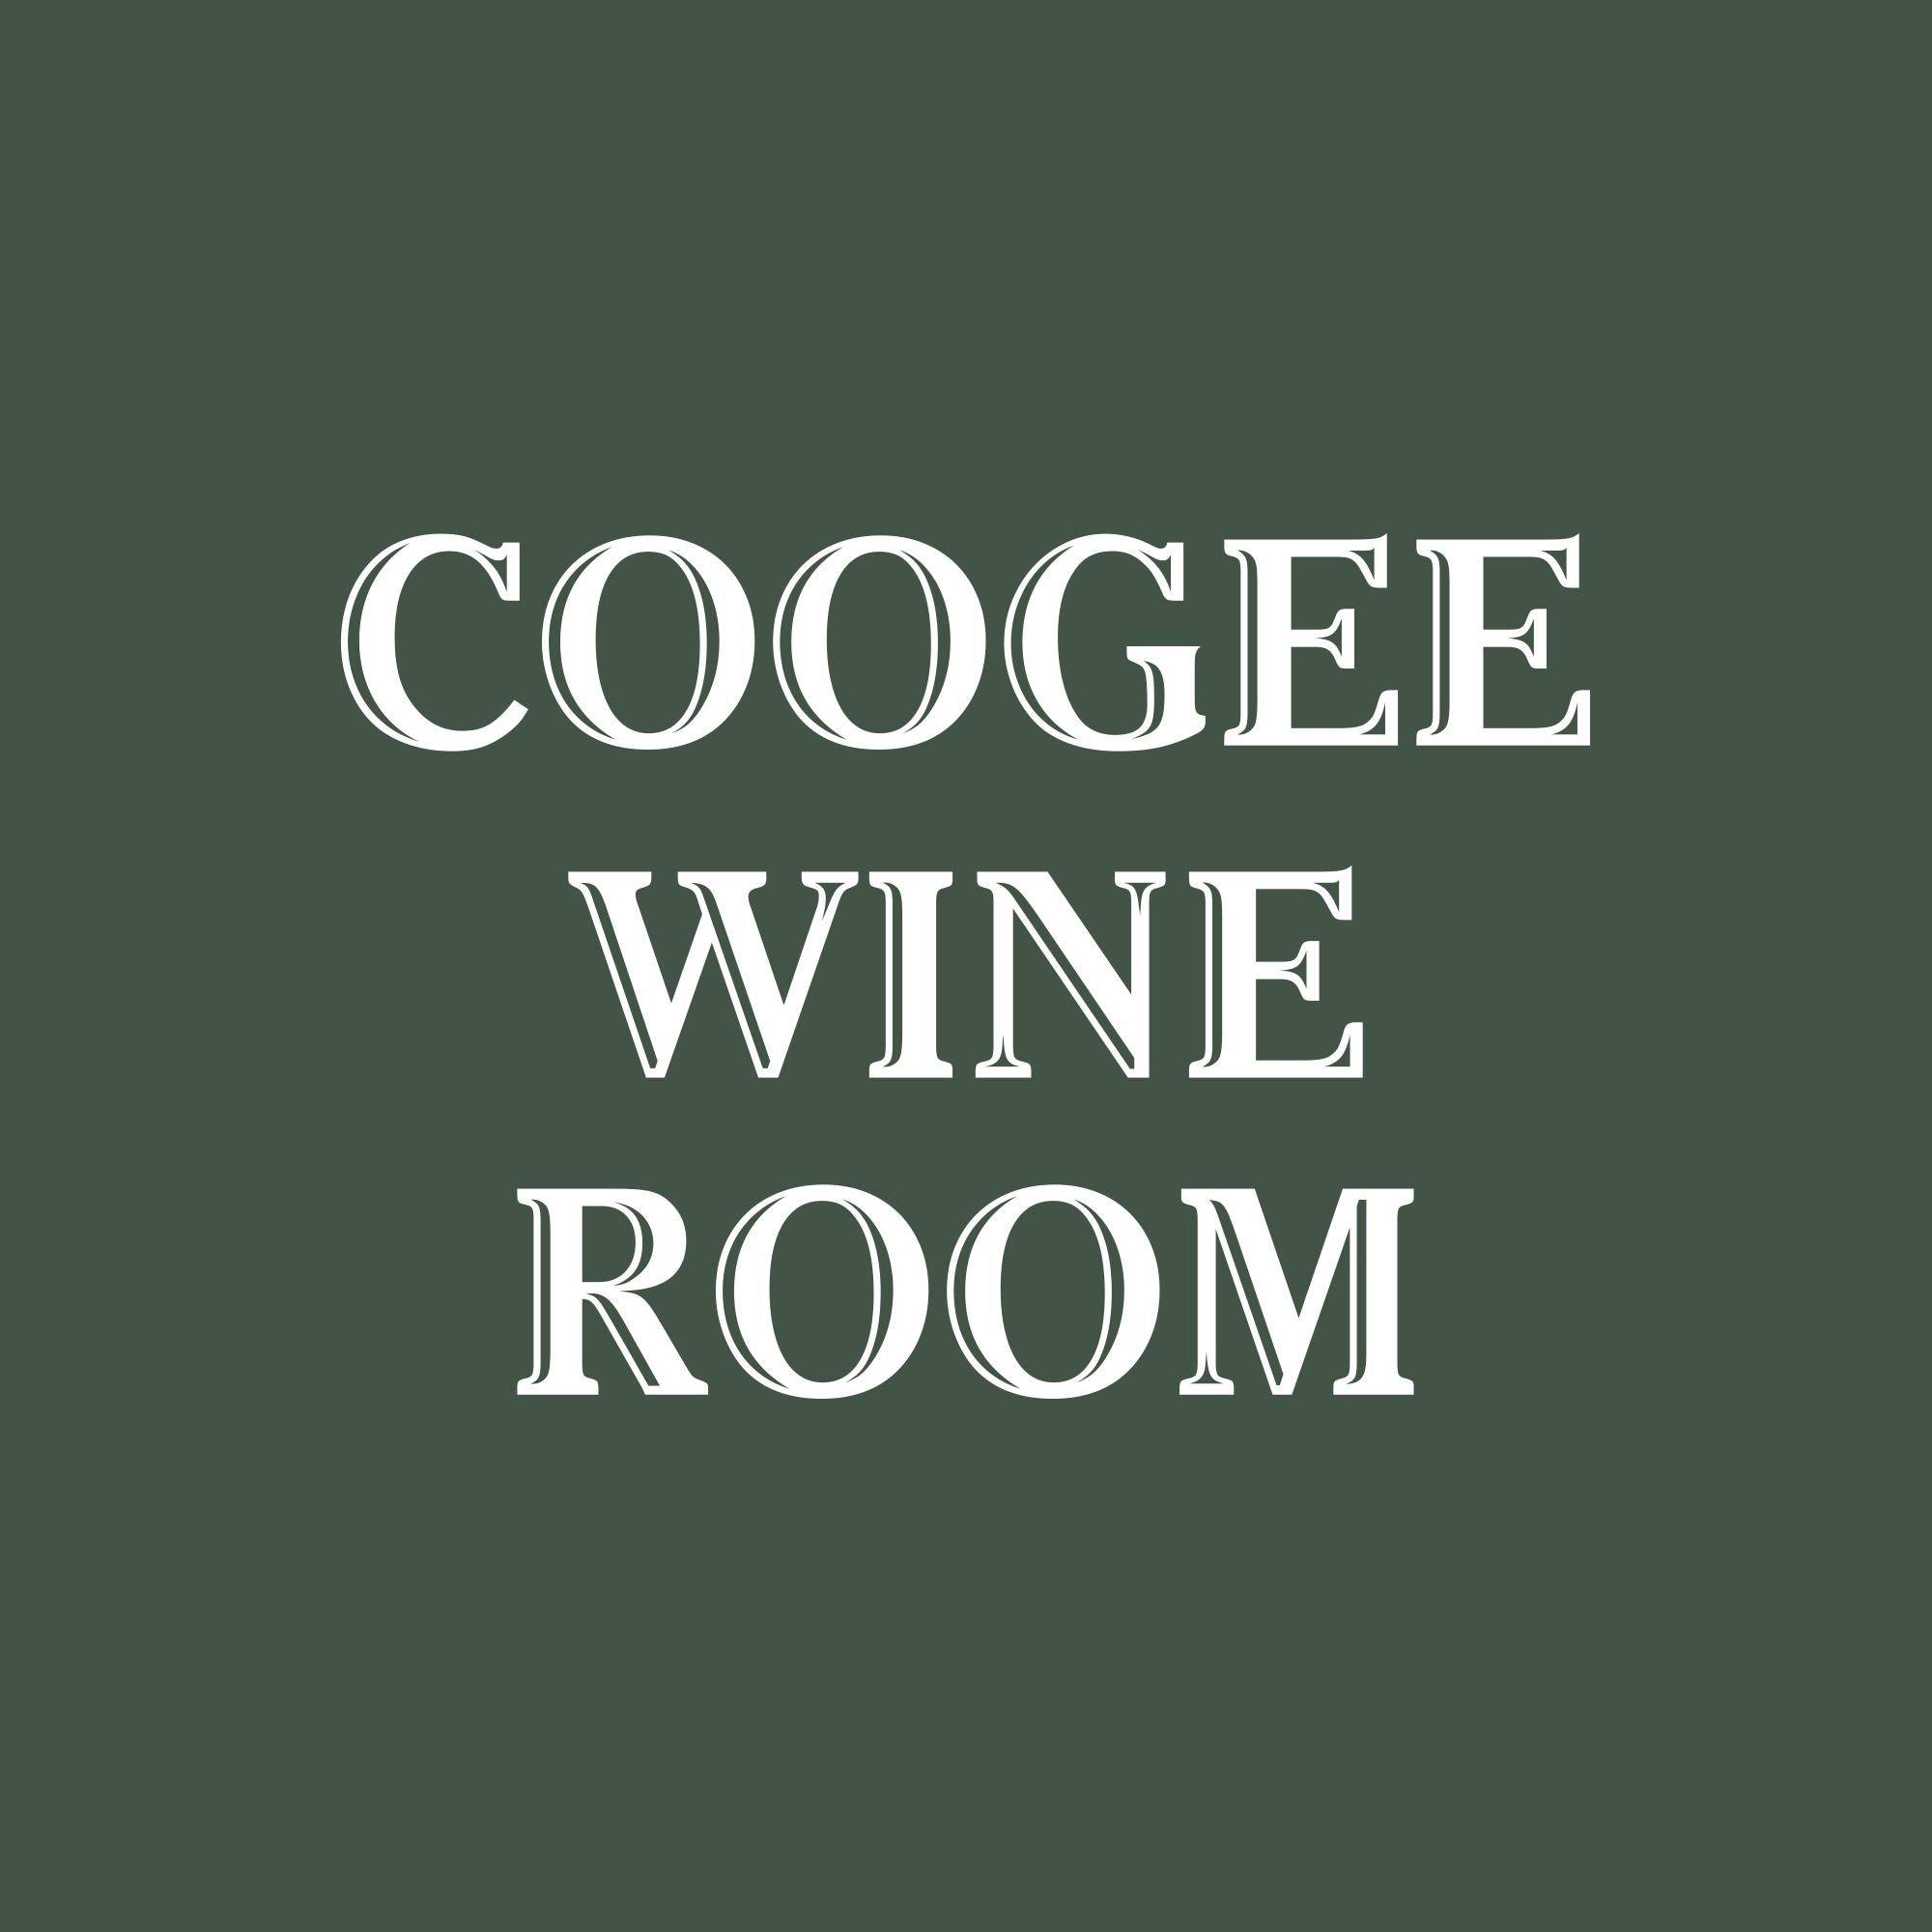 sydney design social coogee wine room stacked logo branding